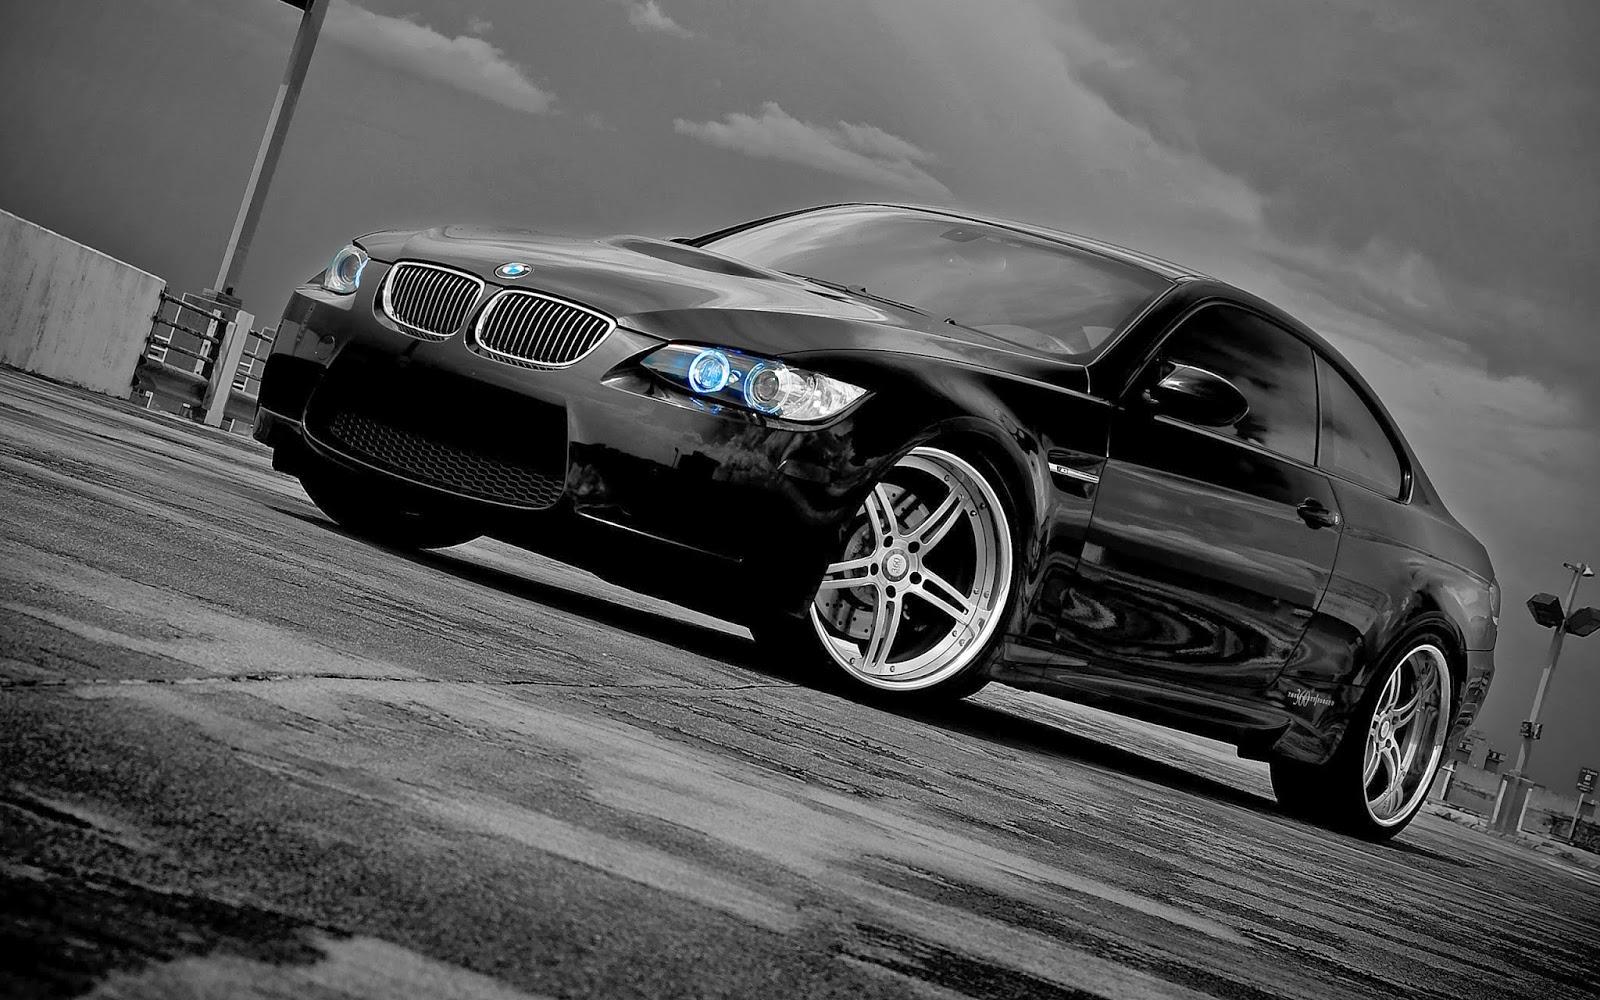 46+ BMW HD Wallpapers 1080p on WallpaperSafari